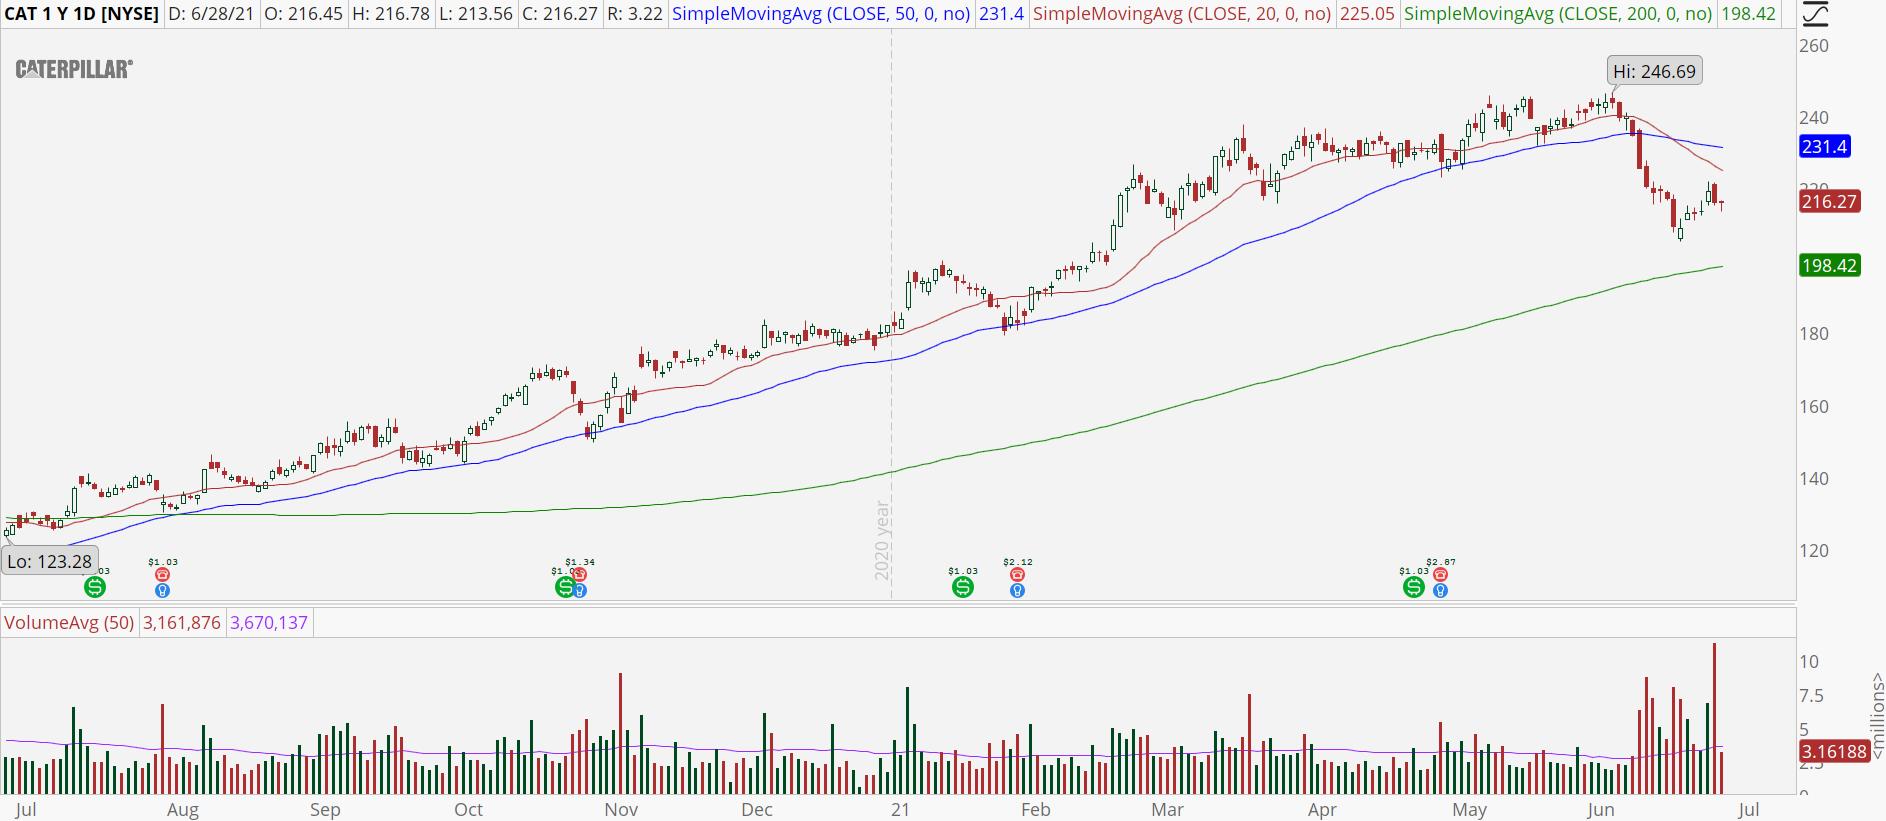 Caterpillar (CAT) stock chart with bear retracement